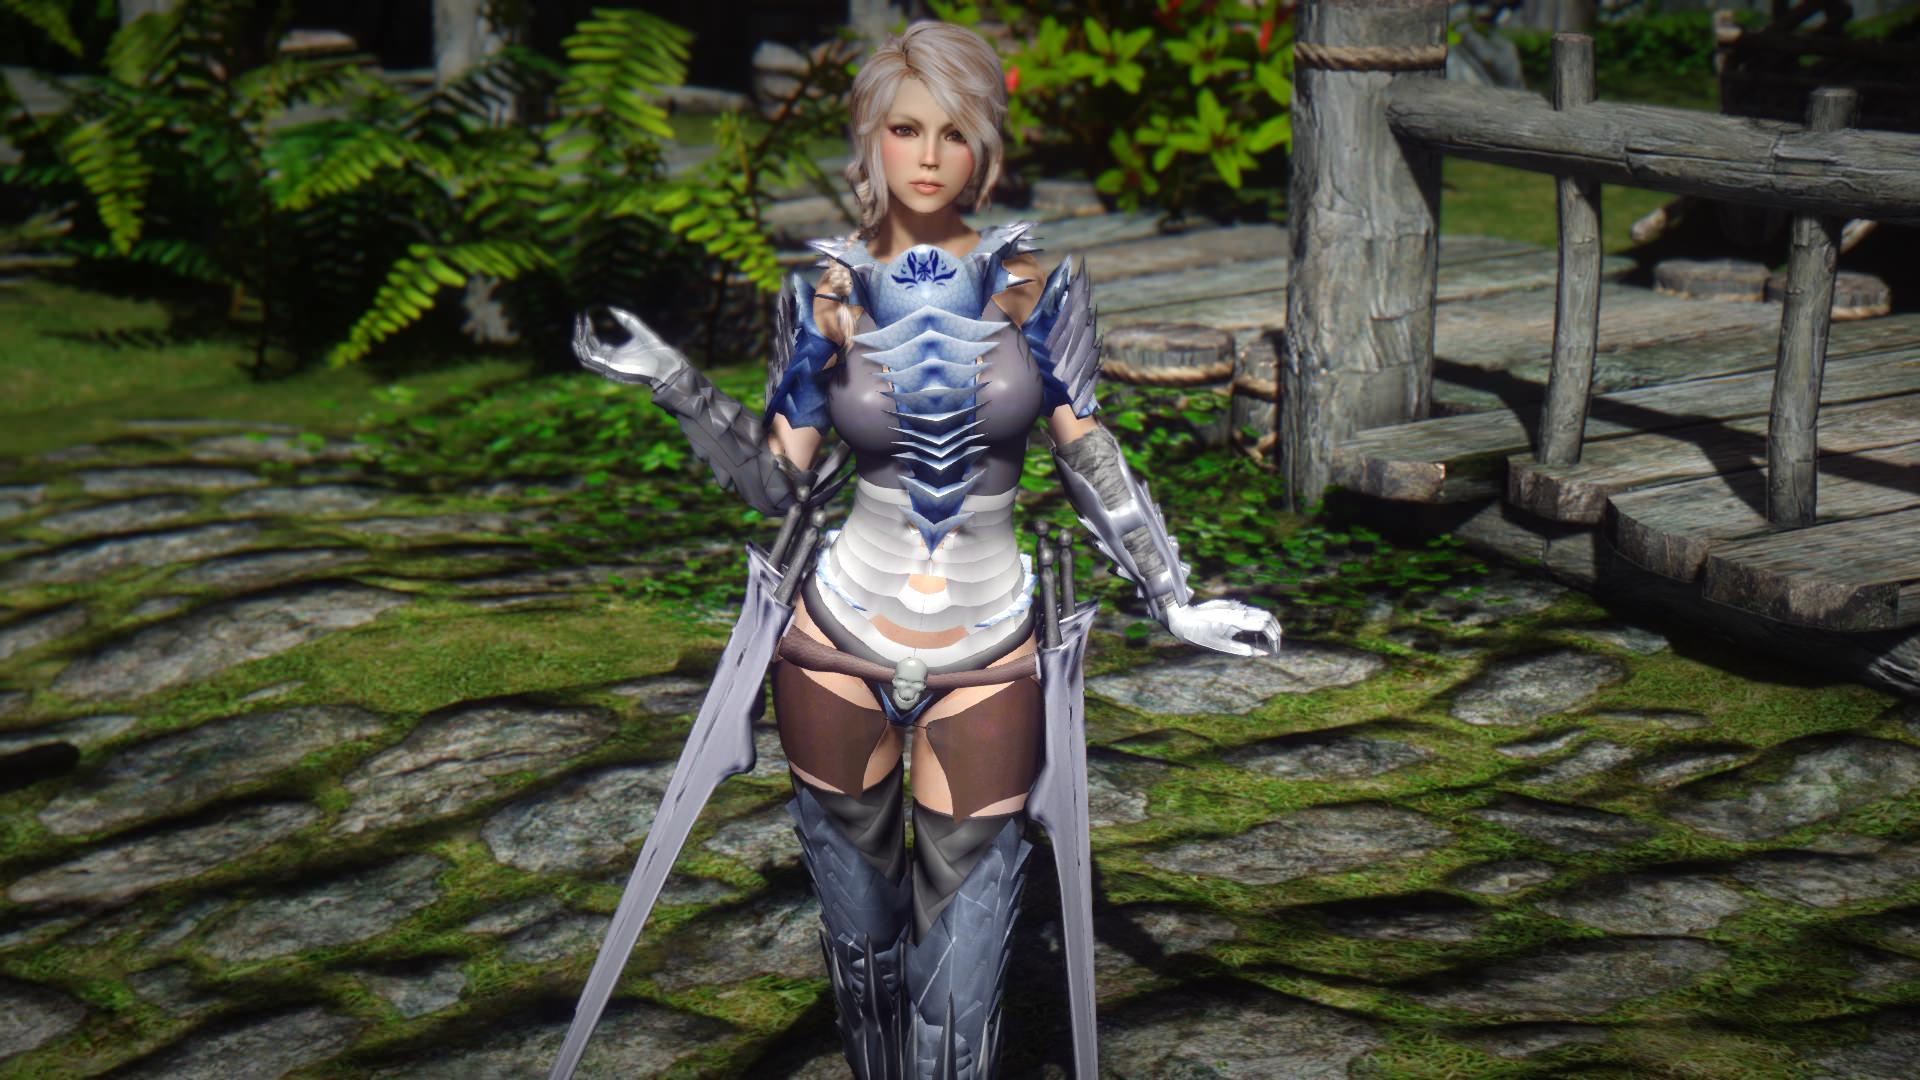 Keel_battle_armor_CBBE_1.jpg